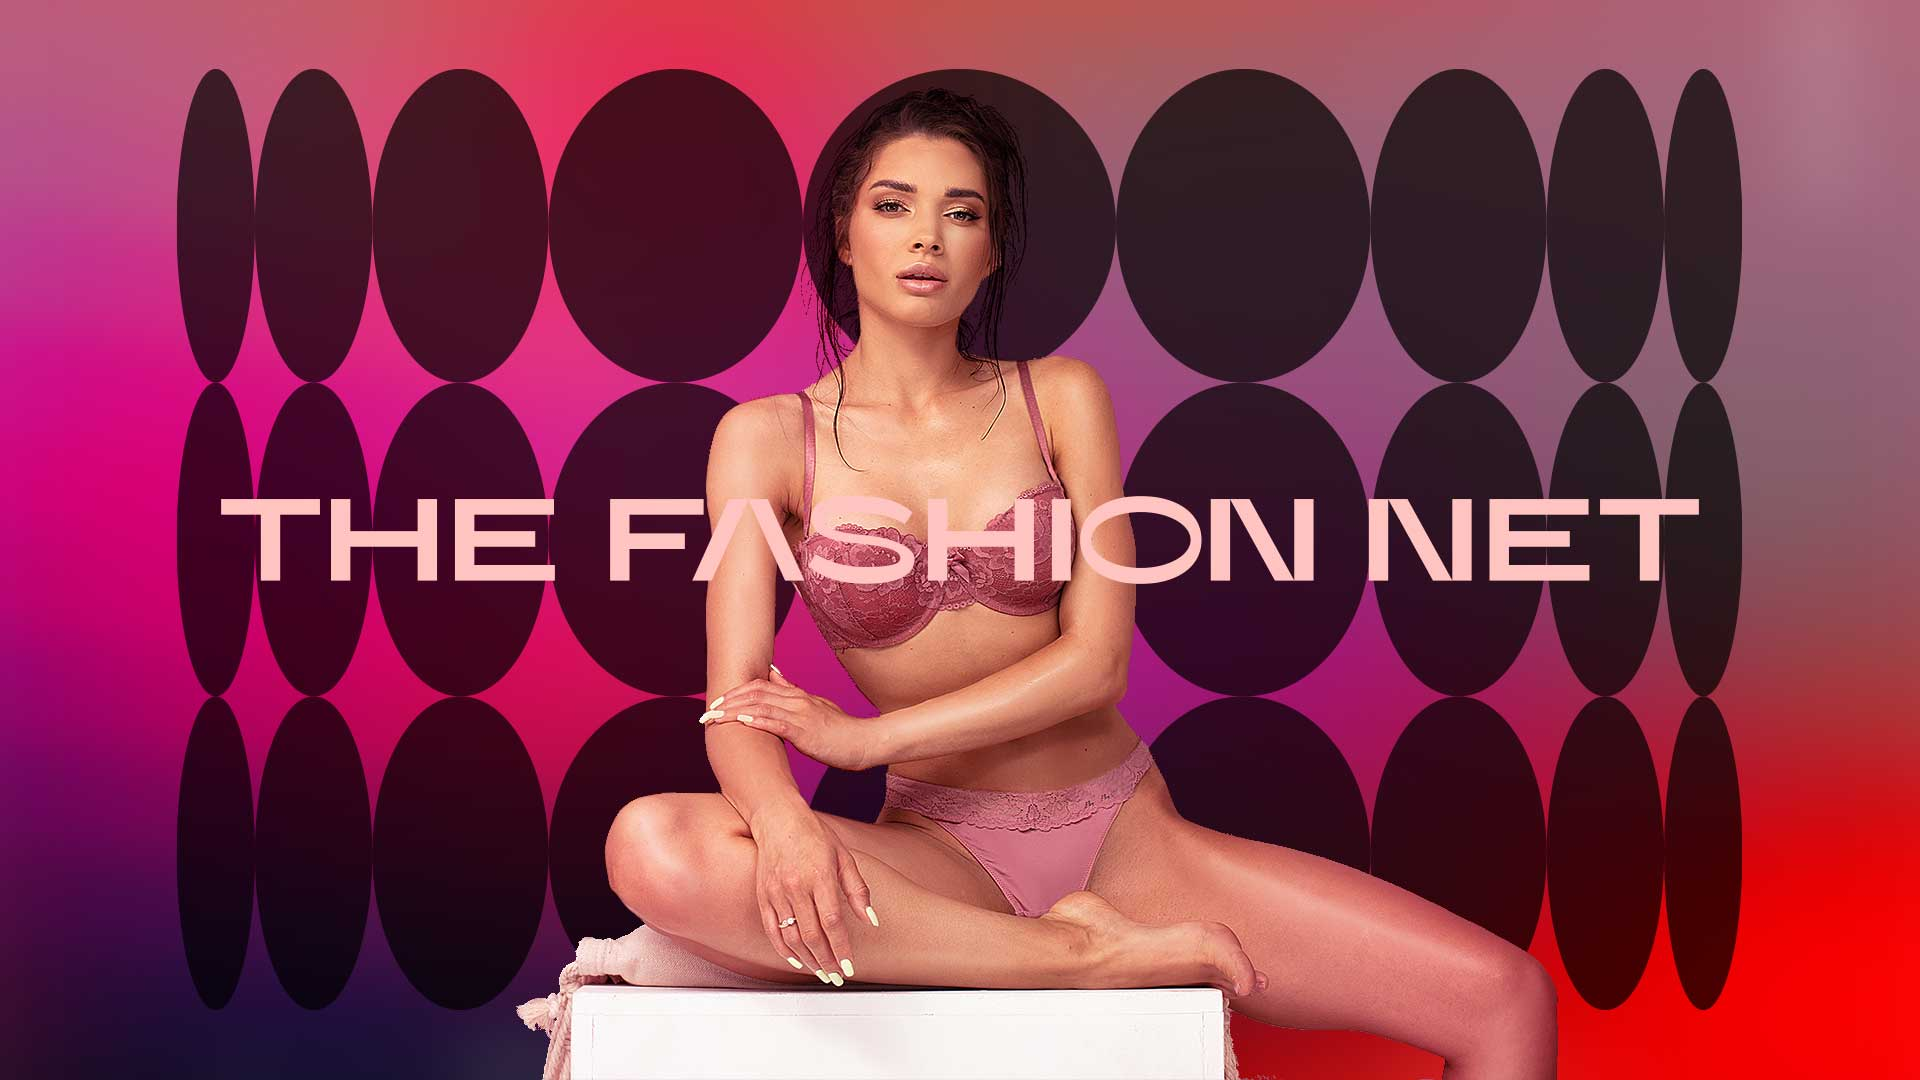 The Fashion Net Brand Identity